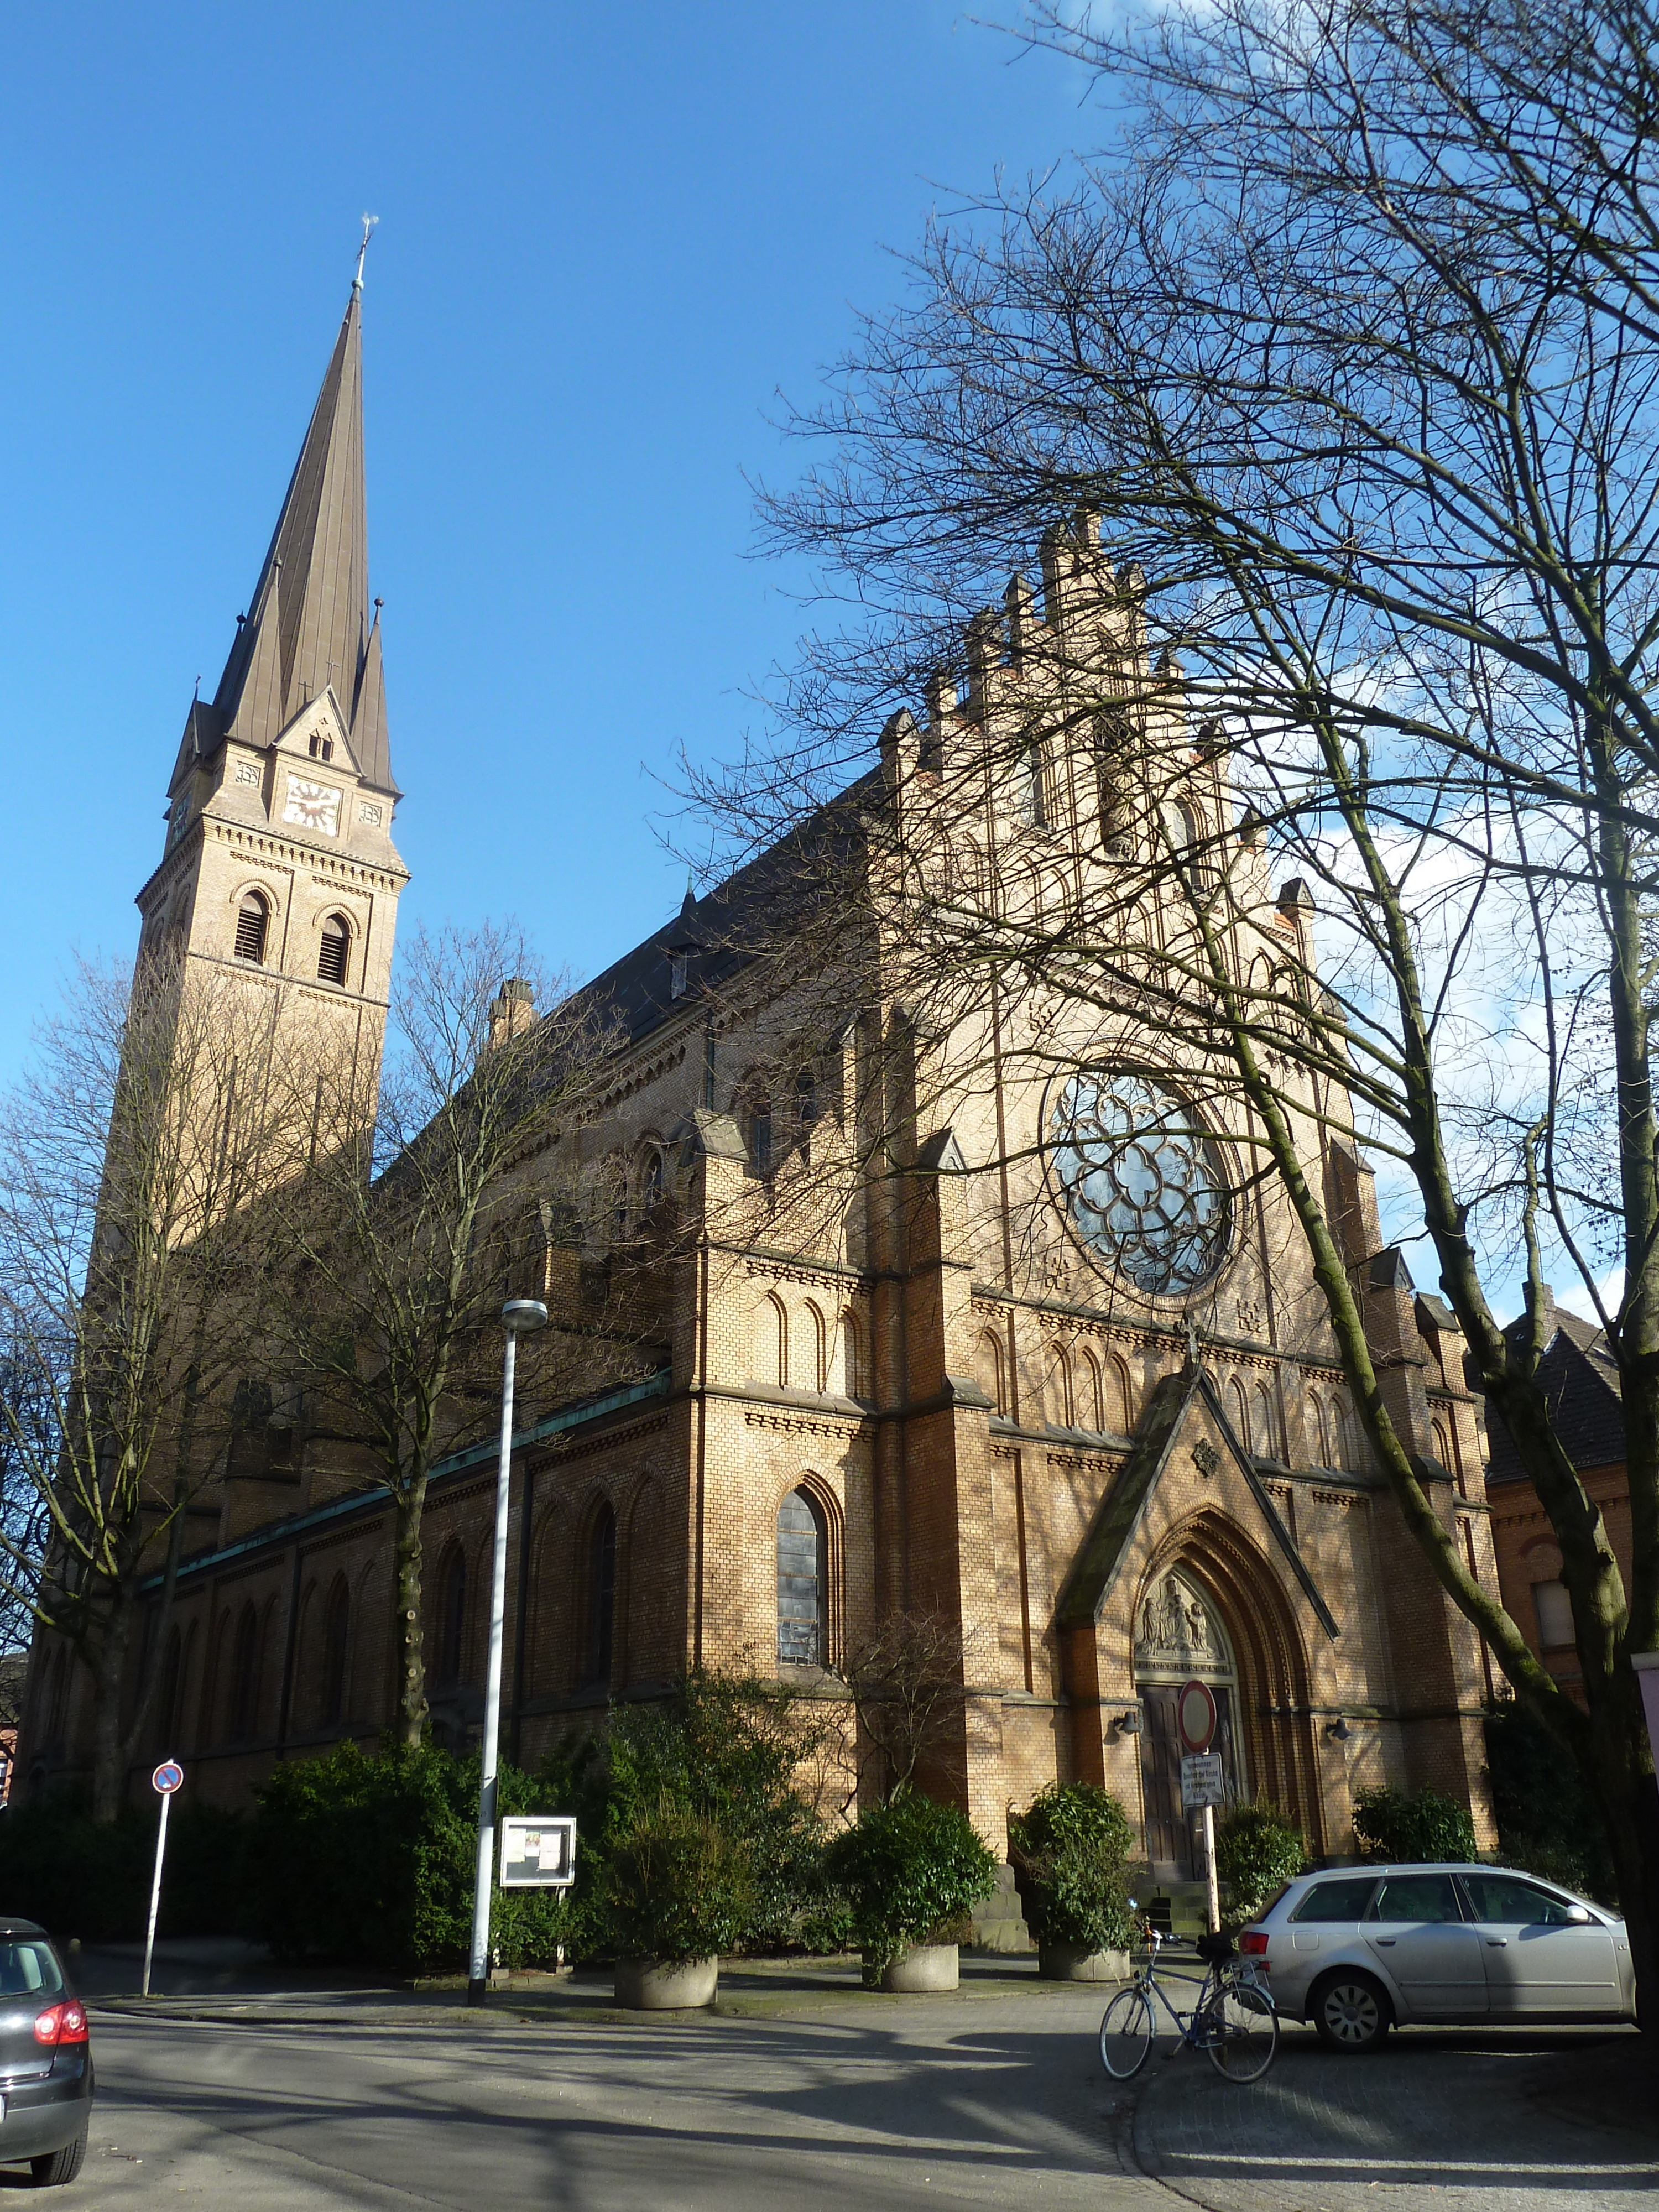 Katholische Kirche Mülheim An Der Ruhr